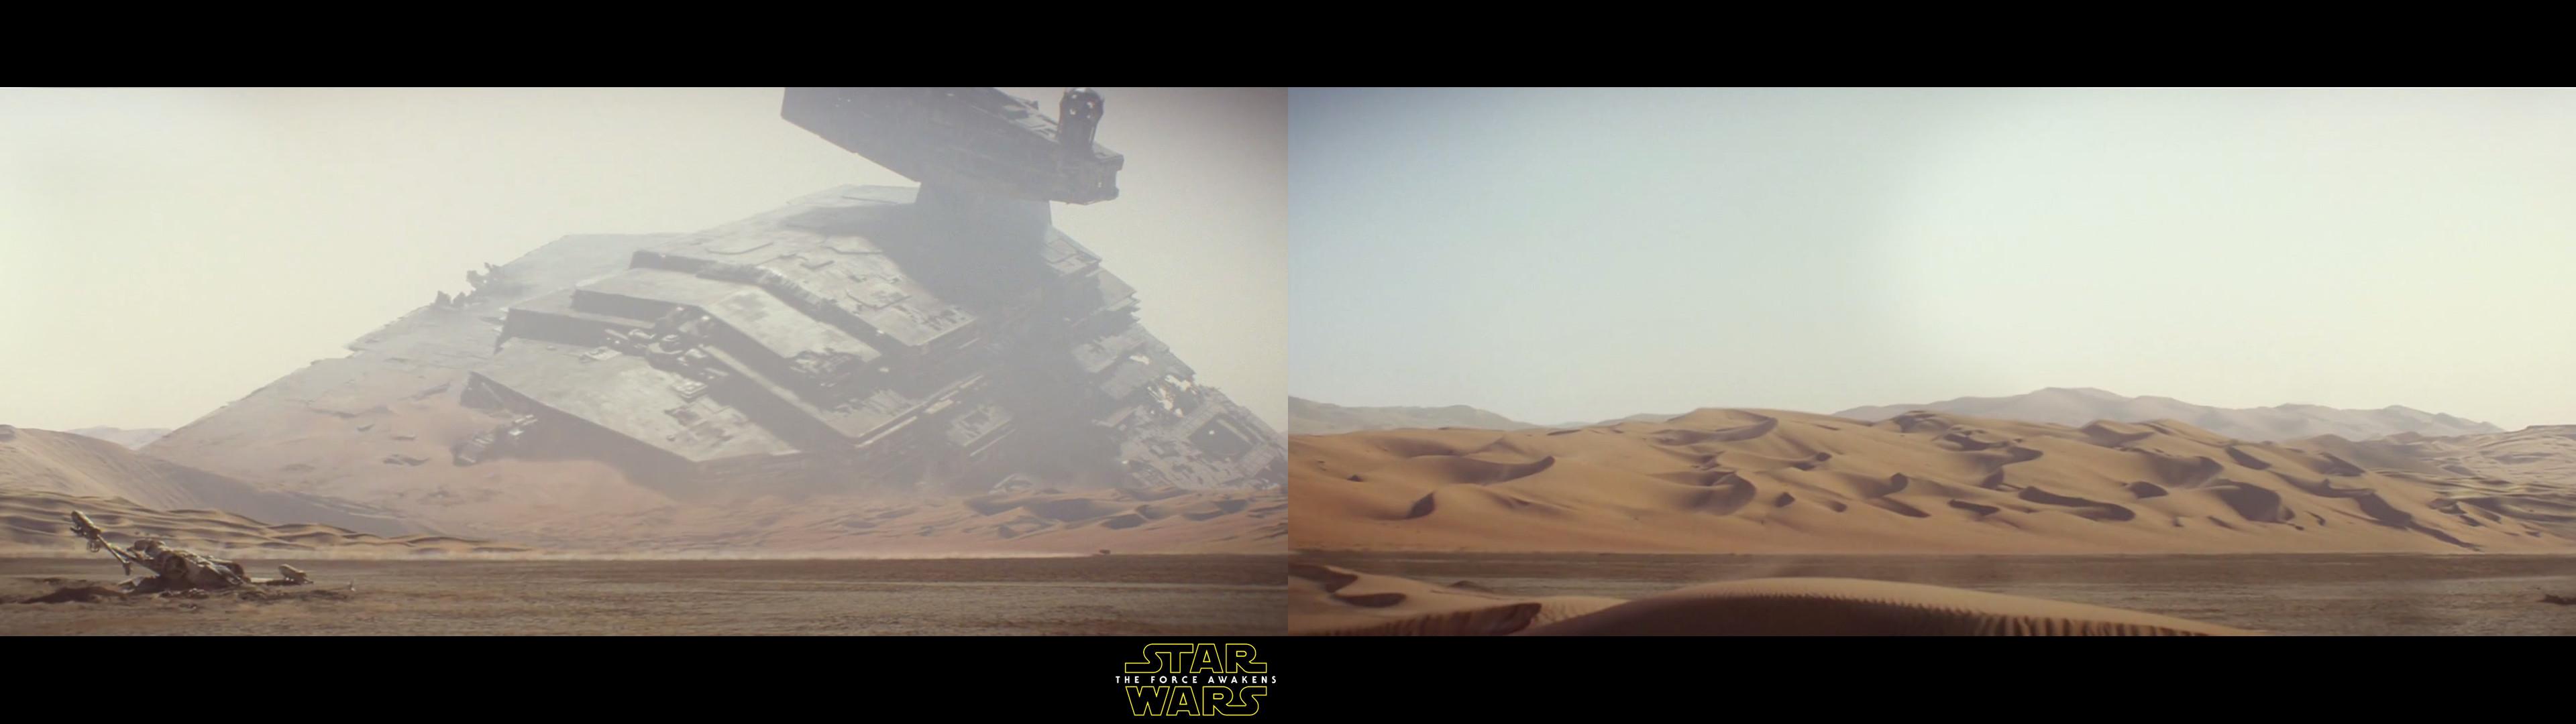 Star Wars Dual Screen Wallpaper Data Src Star Wars Dual Screen 3840x1080 Wallpaper Teahub Io